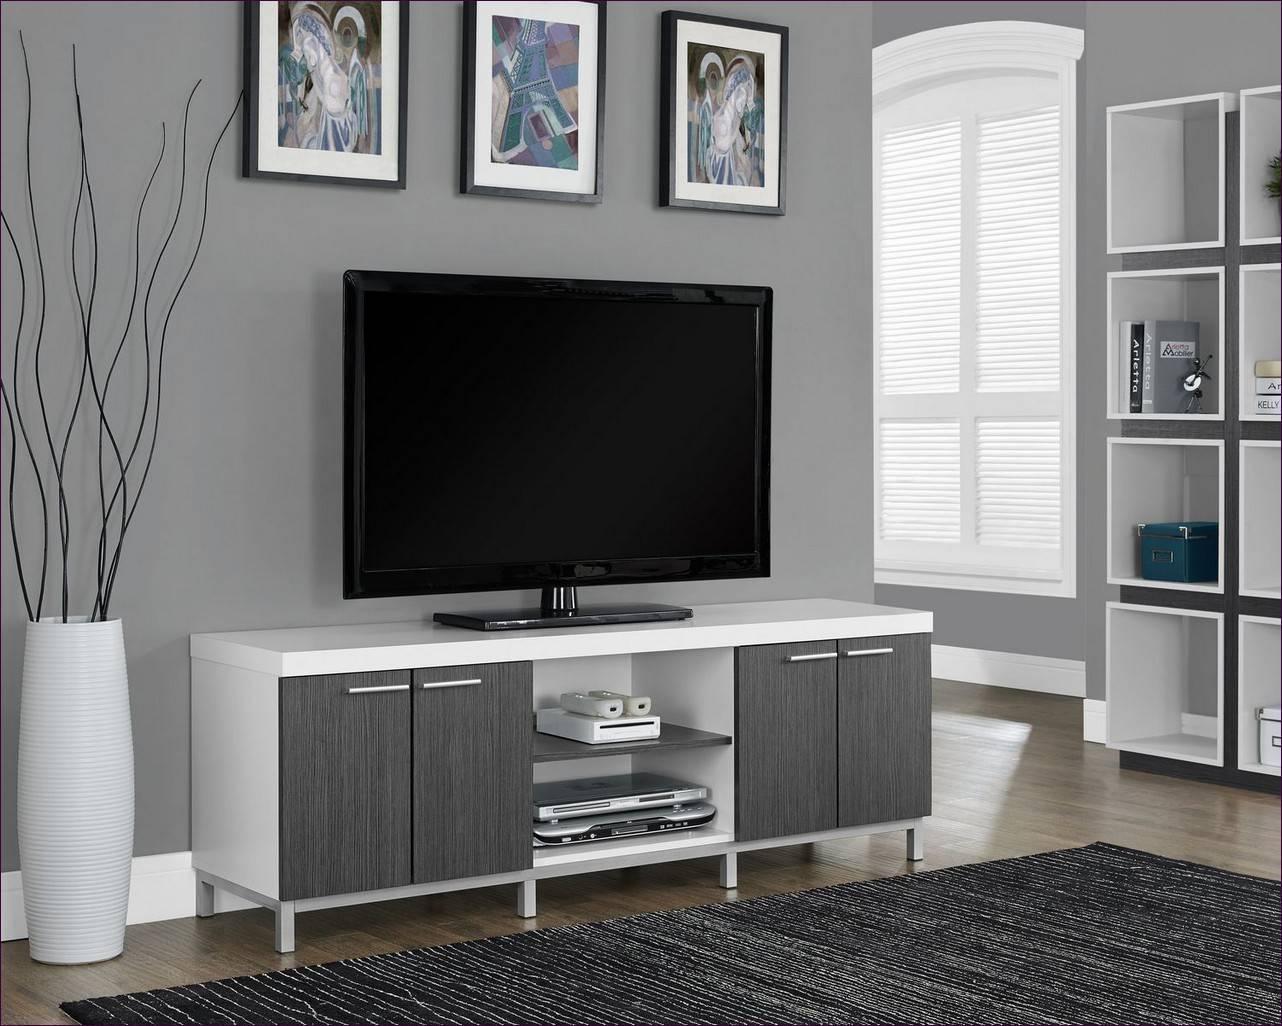 Bedroom : Slim Tv Stand 32 Inch Corner Tv Stand Tall Tv Stand Tv throughout 24 Inch Corner Tv Stands (Image 2 of 15)